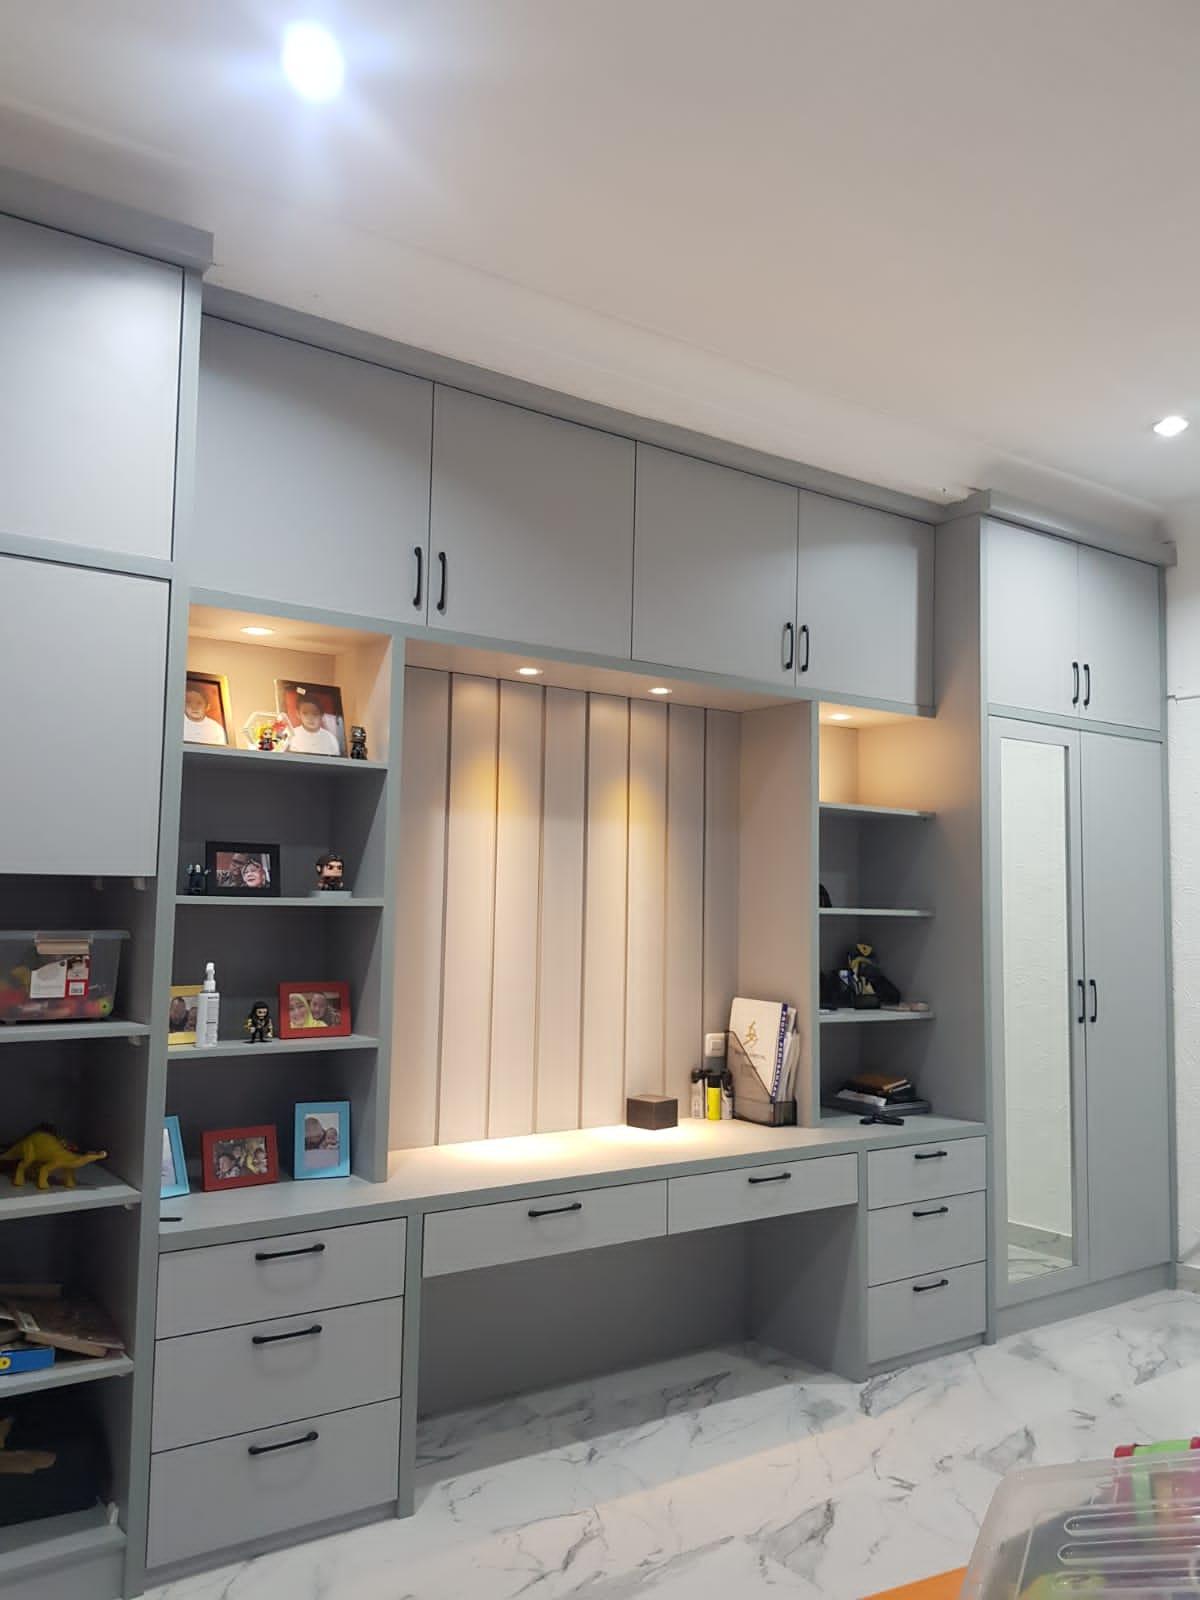 Project Belia Kitchen Set - Lemari Serbaguna - Pondok Indah - Ibu Tyaimage00008